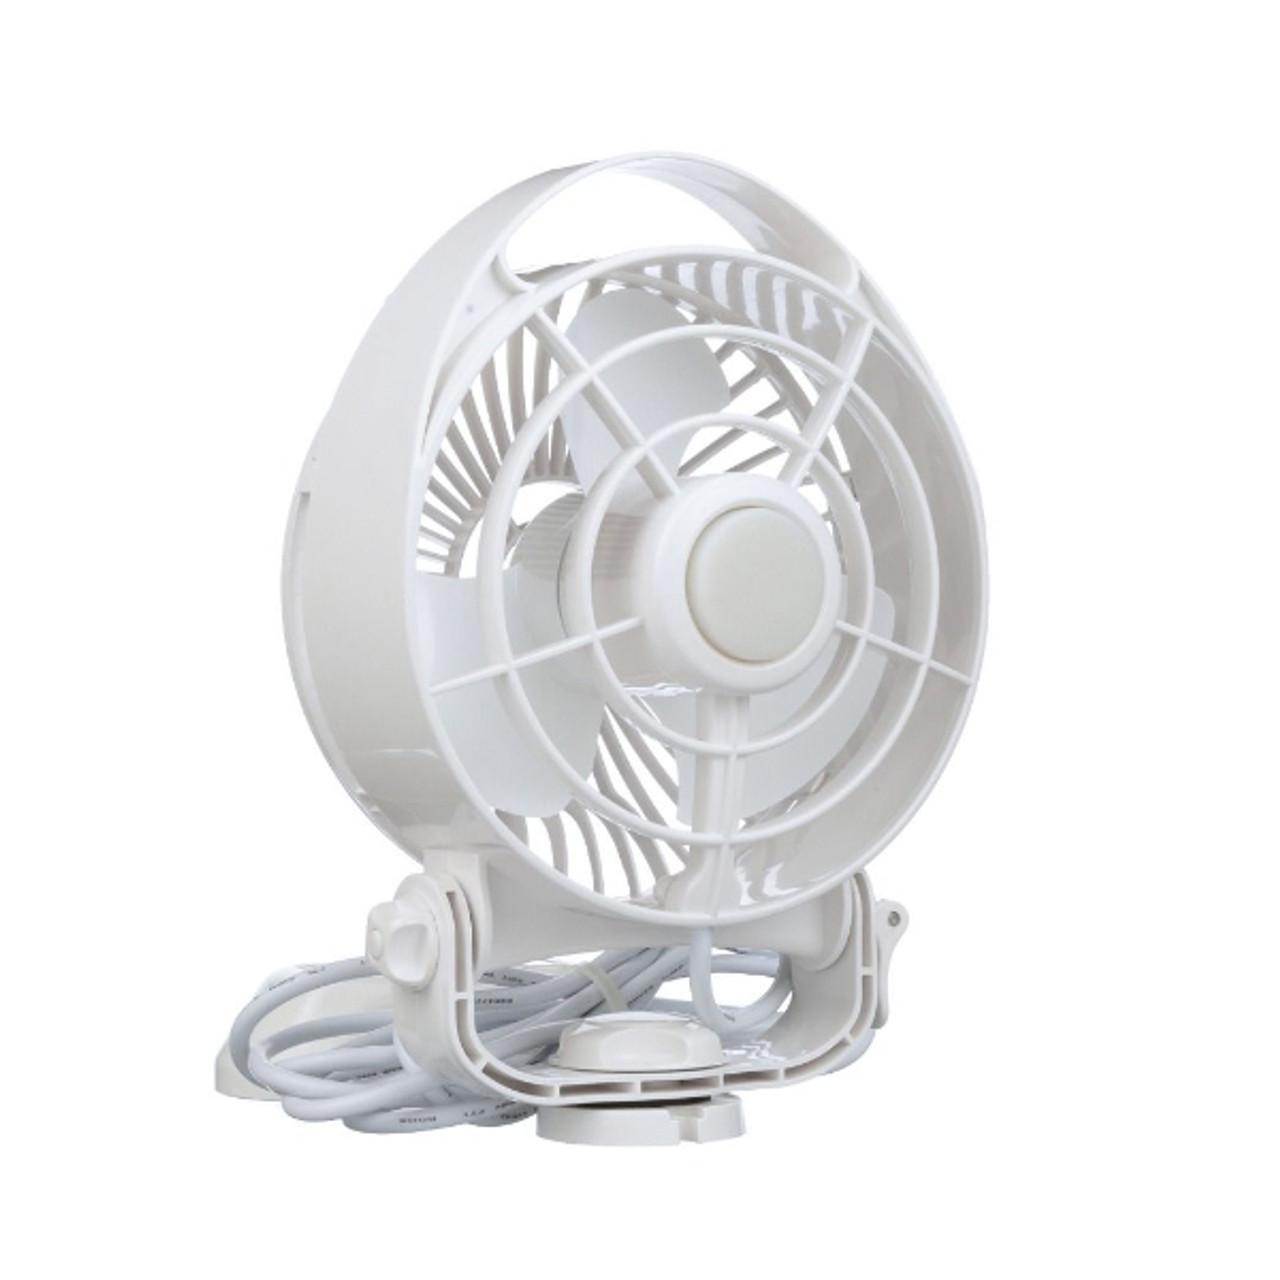 "Caframo Maestro 12V 3-Speed 6/"" Marine Fan w//LED Light Black"